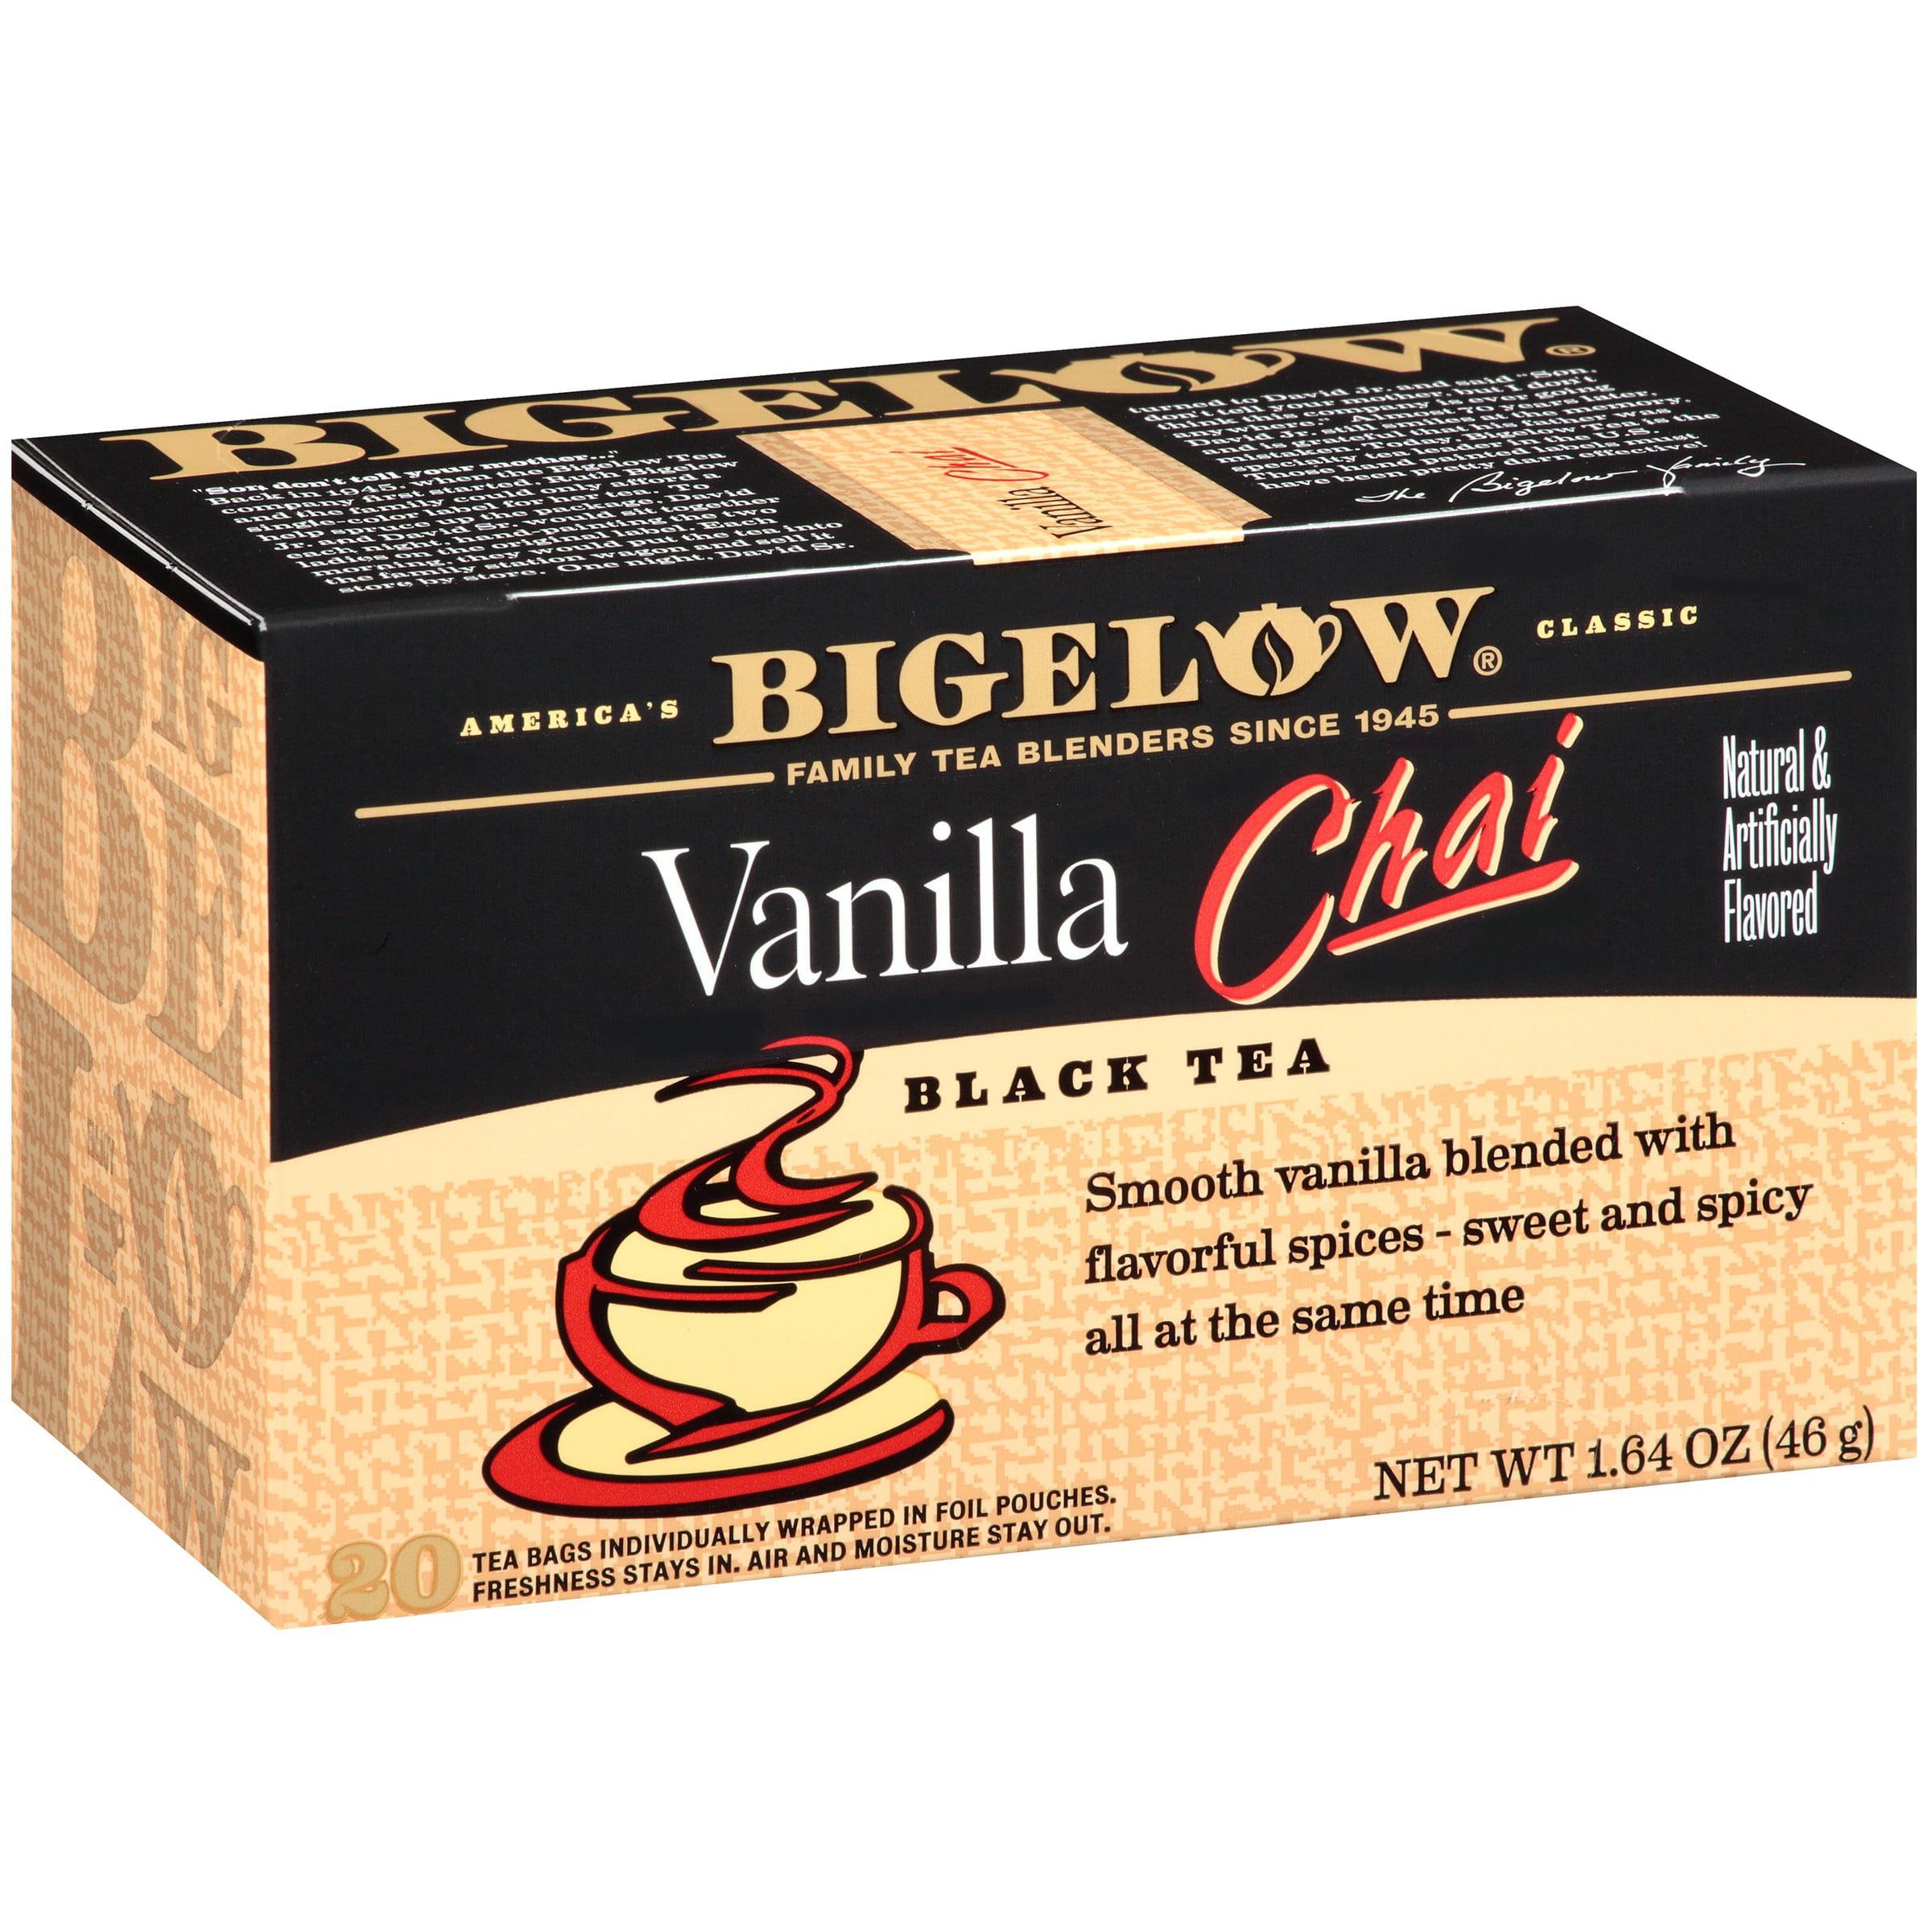 Bigelow Vanilla Chai Black Tea Blend 20 ct Box by RC Bigelow, Inc.